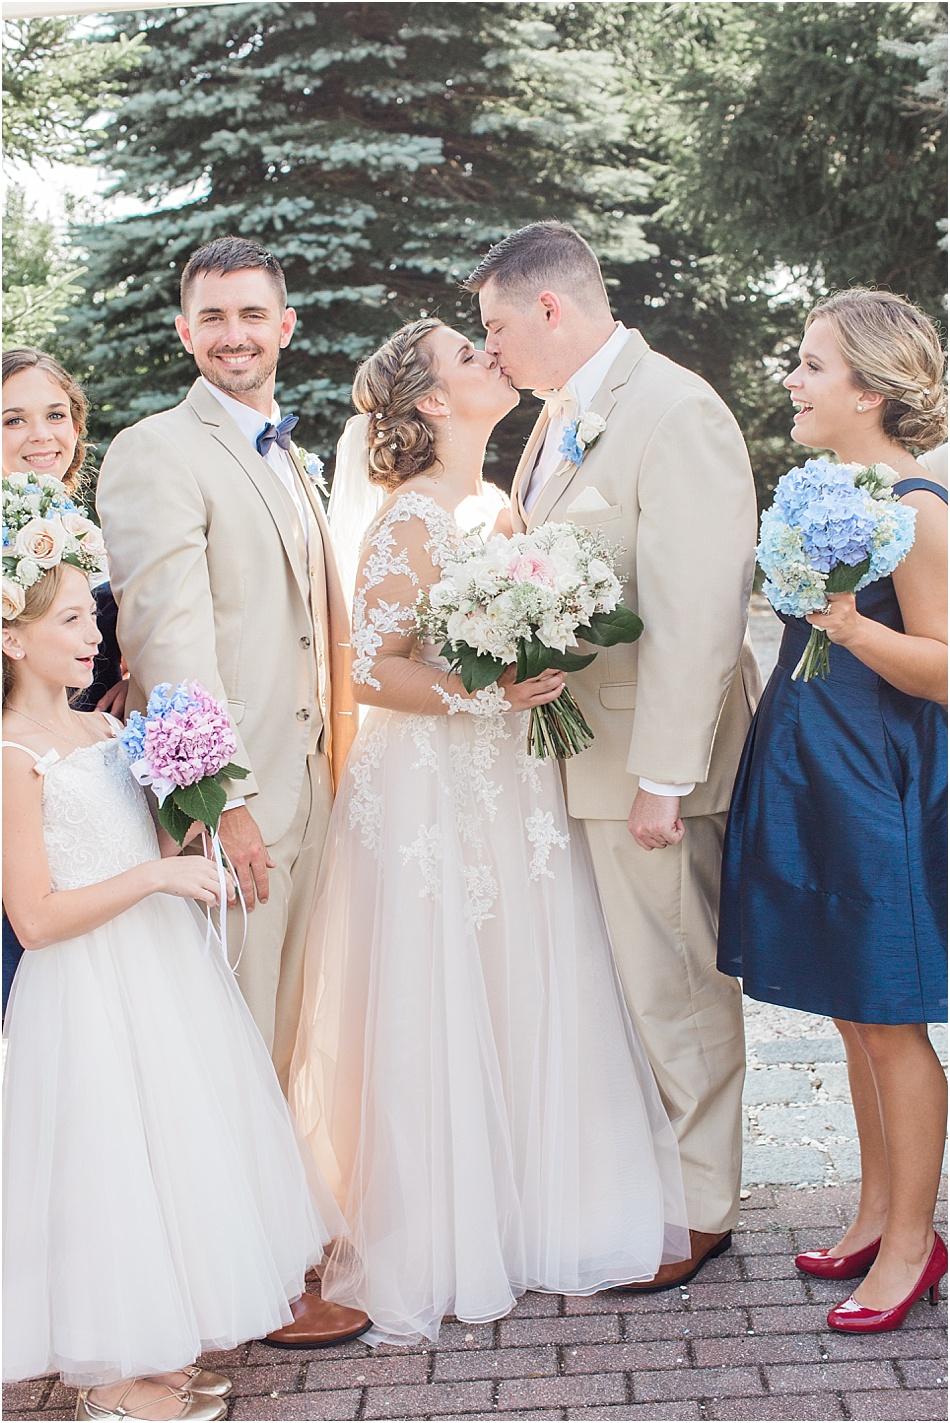 brookside_country_club_cape_cod_boston_wedding_photographer_Meredith_Jane_Photography_photo_0147.jpg